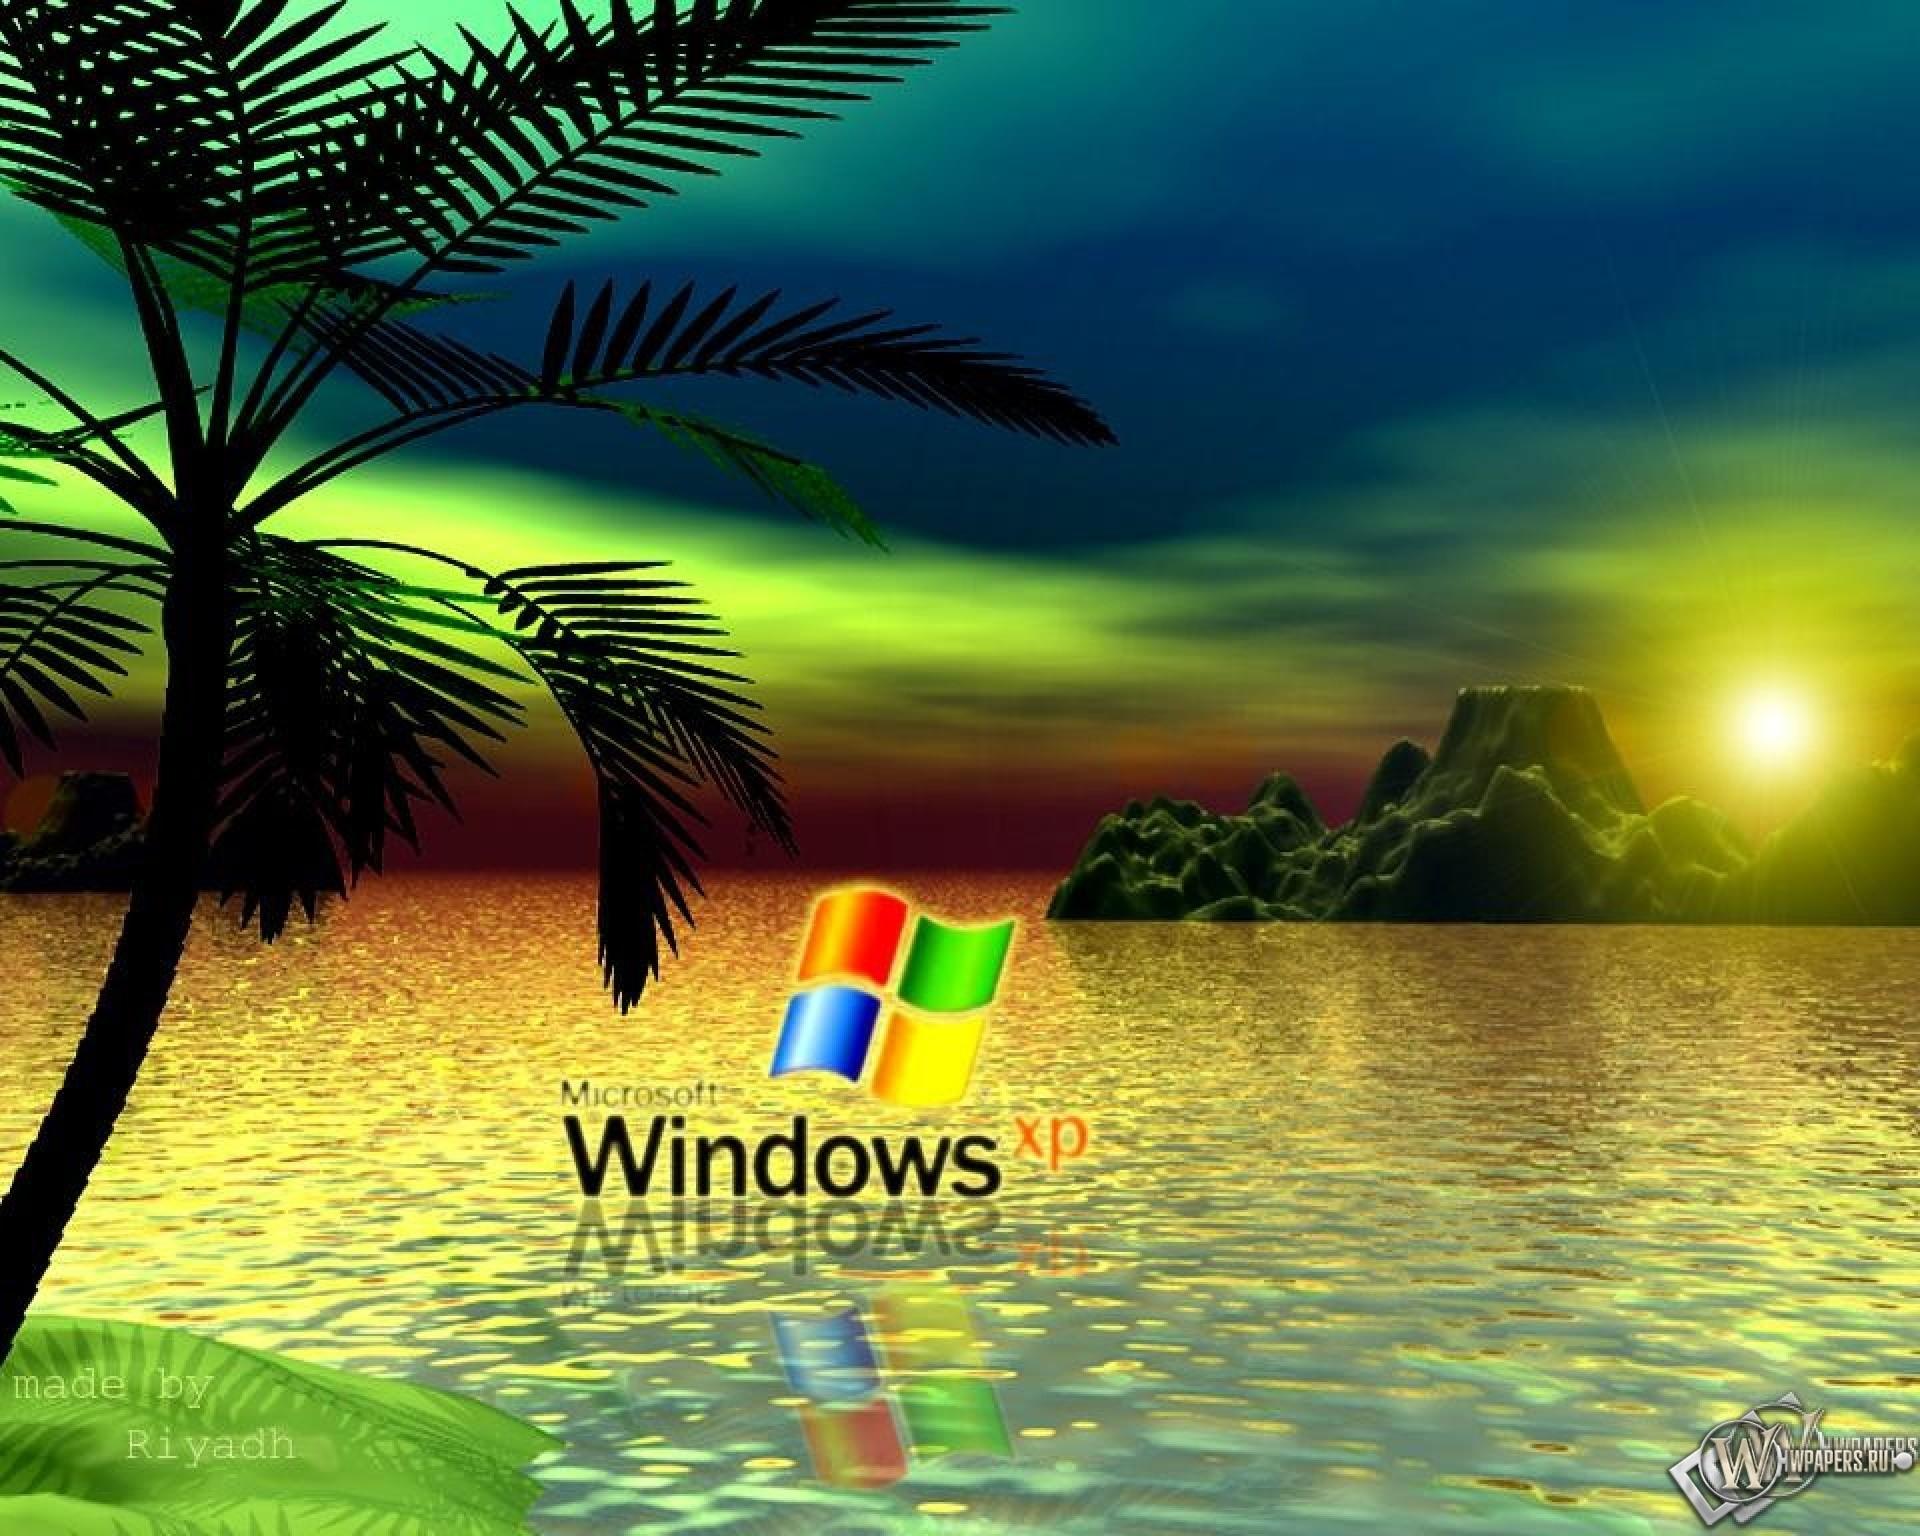 HD Wallpapers P Windows Xp Mobile Free